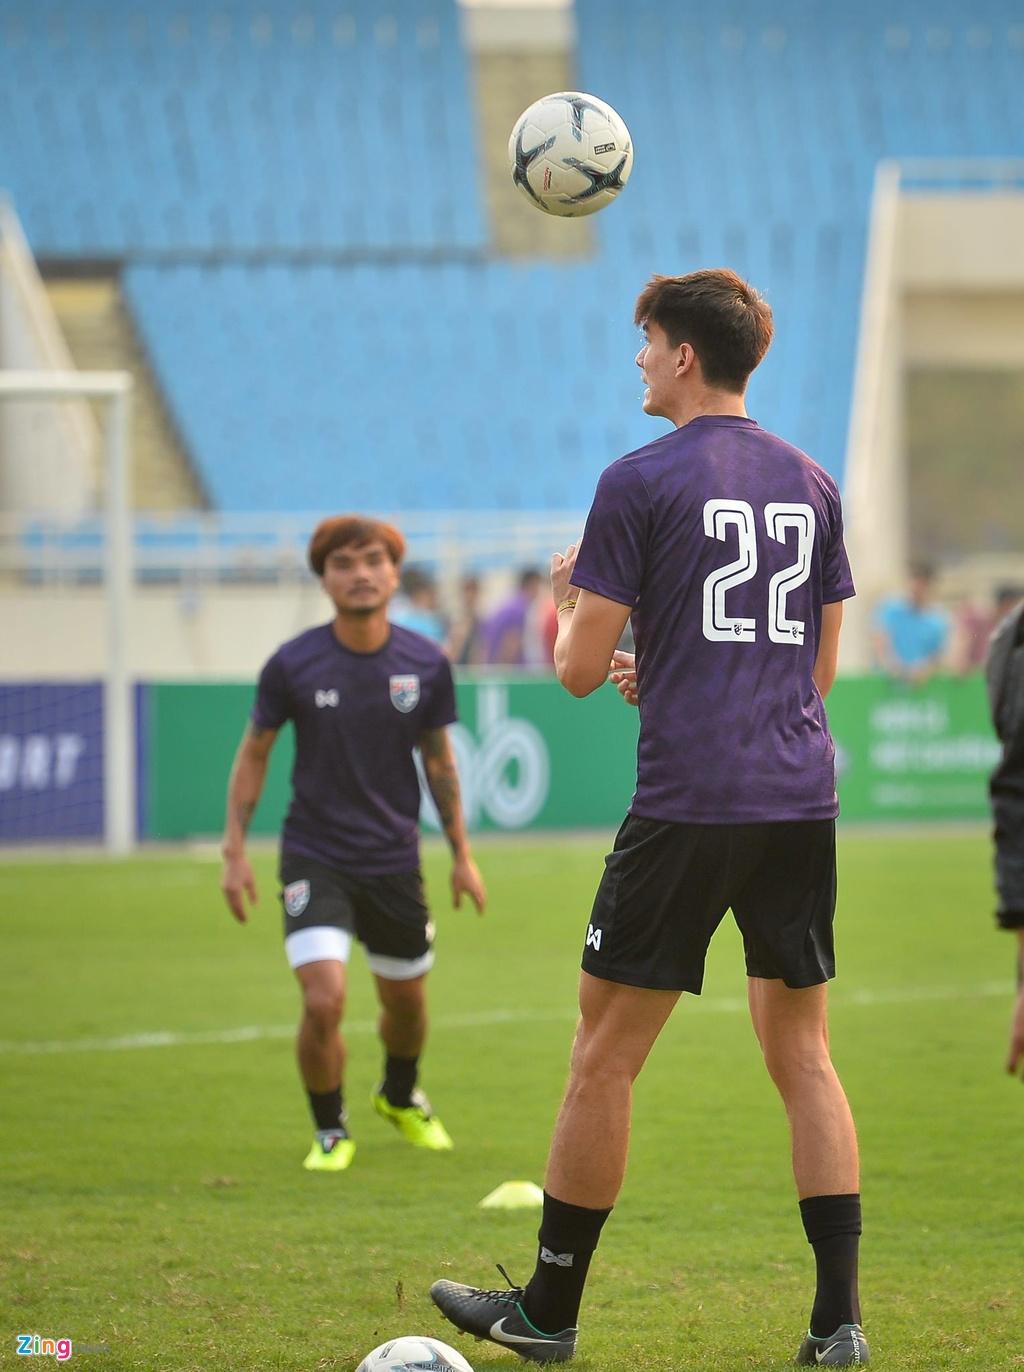 Trung ve cao gan 2 m noi bat trong buoi tap cua U23 Thai Lan hinh anh 3